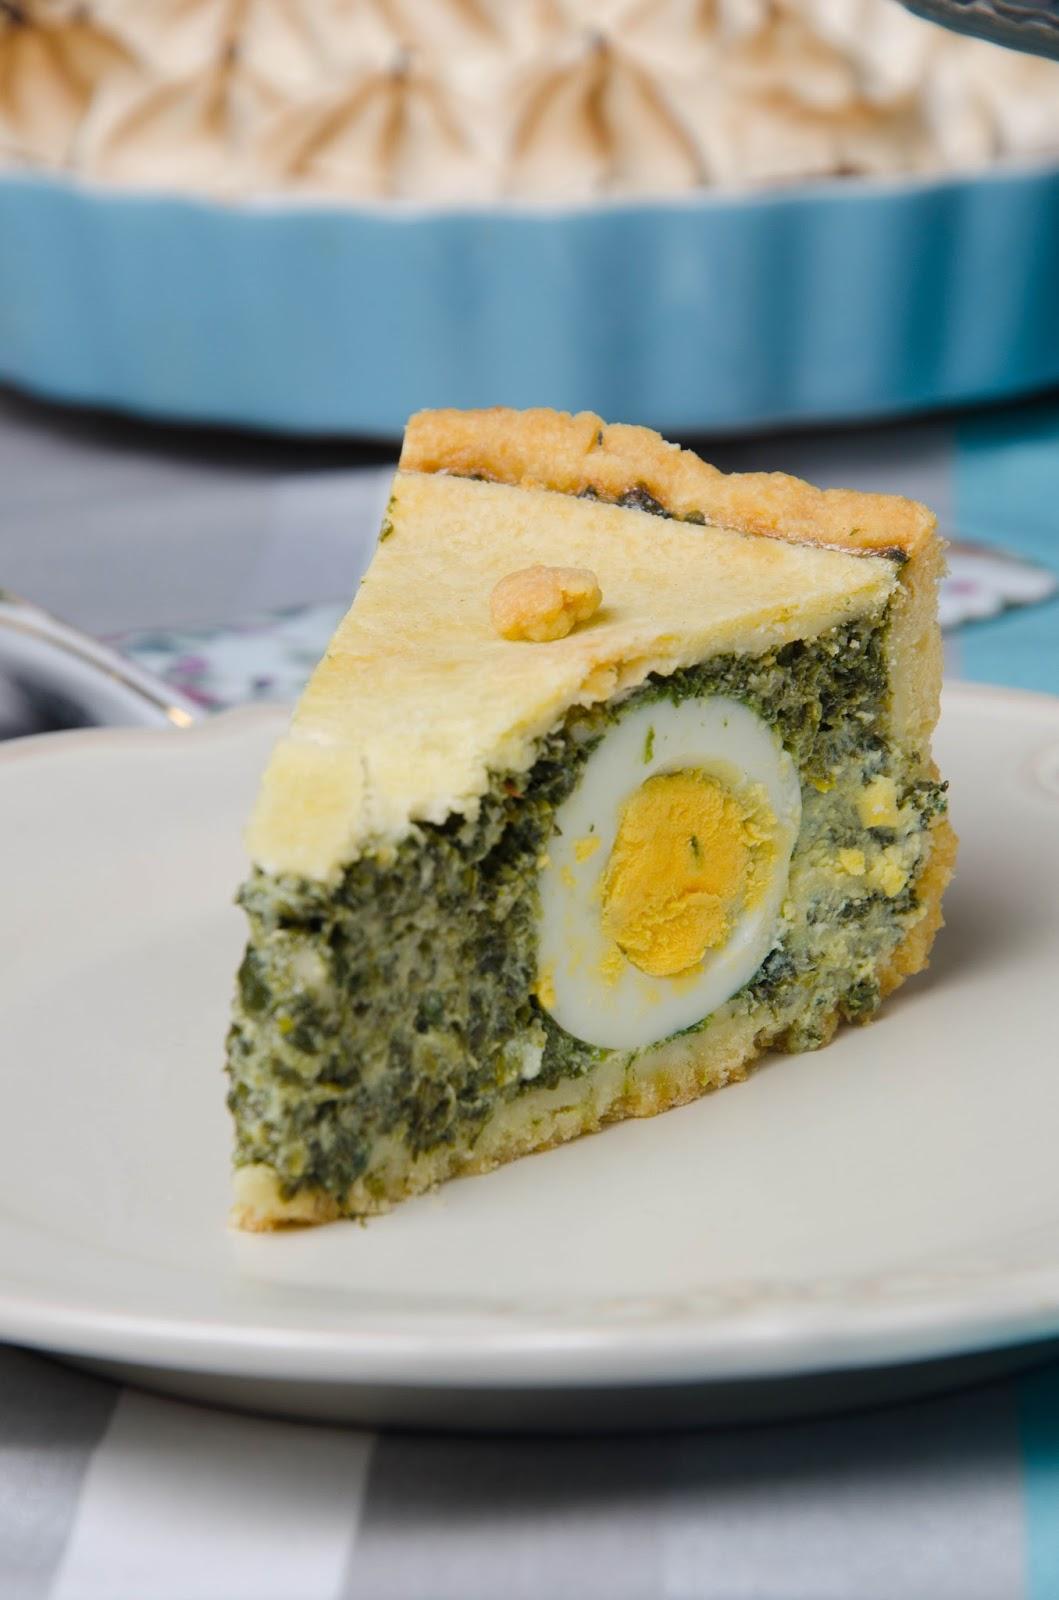 Tort ze szpinakiem i jajkami w kruchym cieście